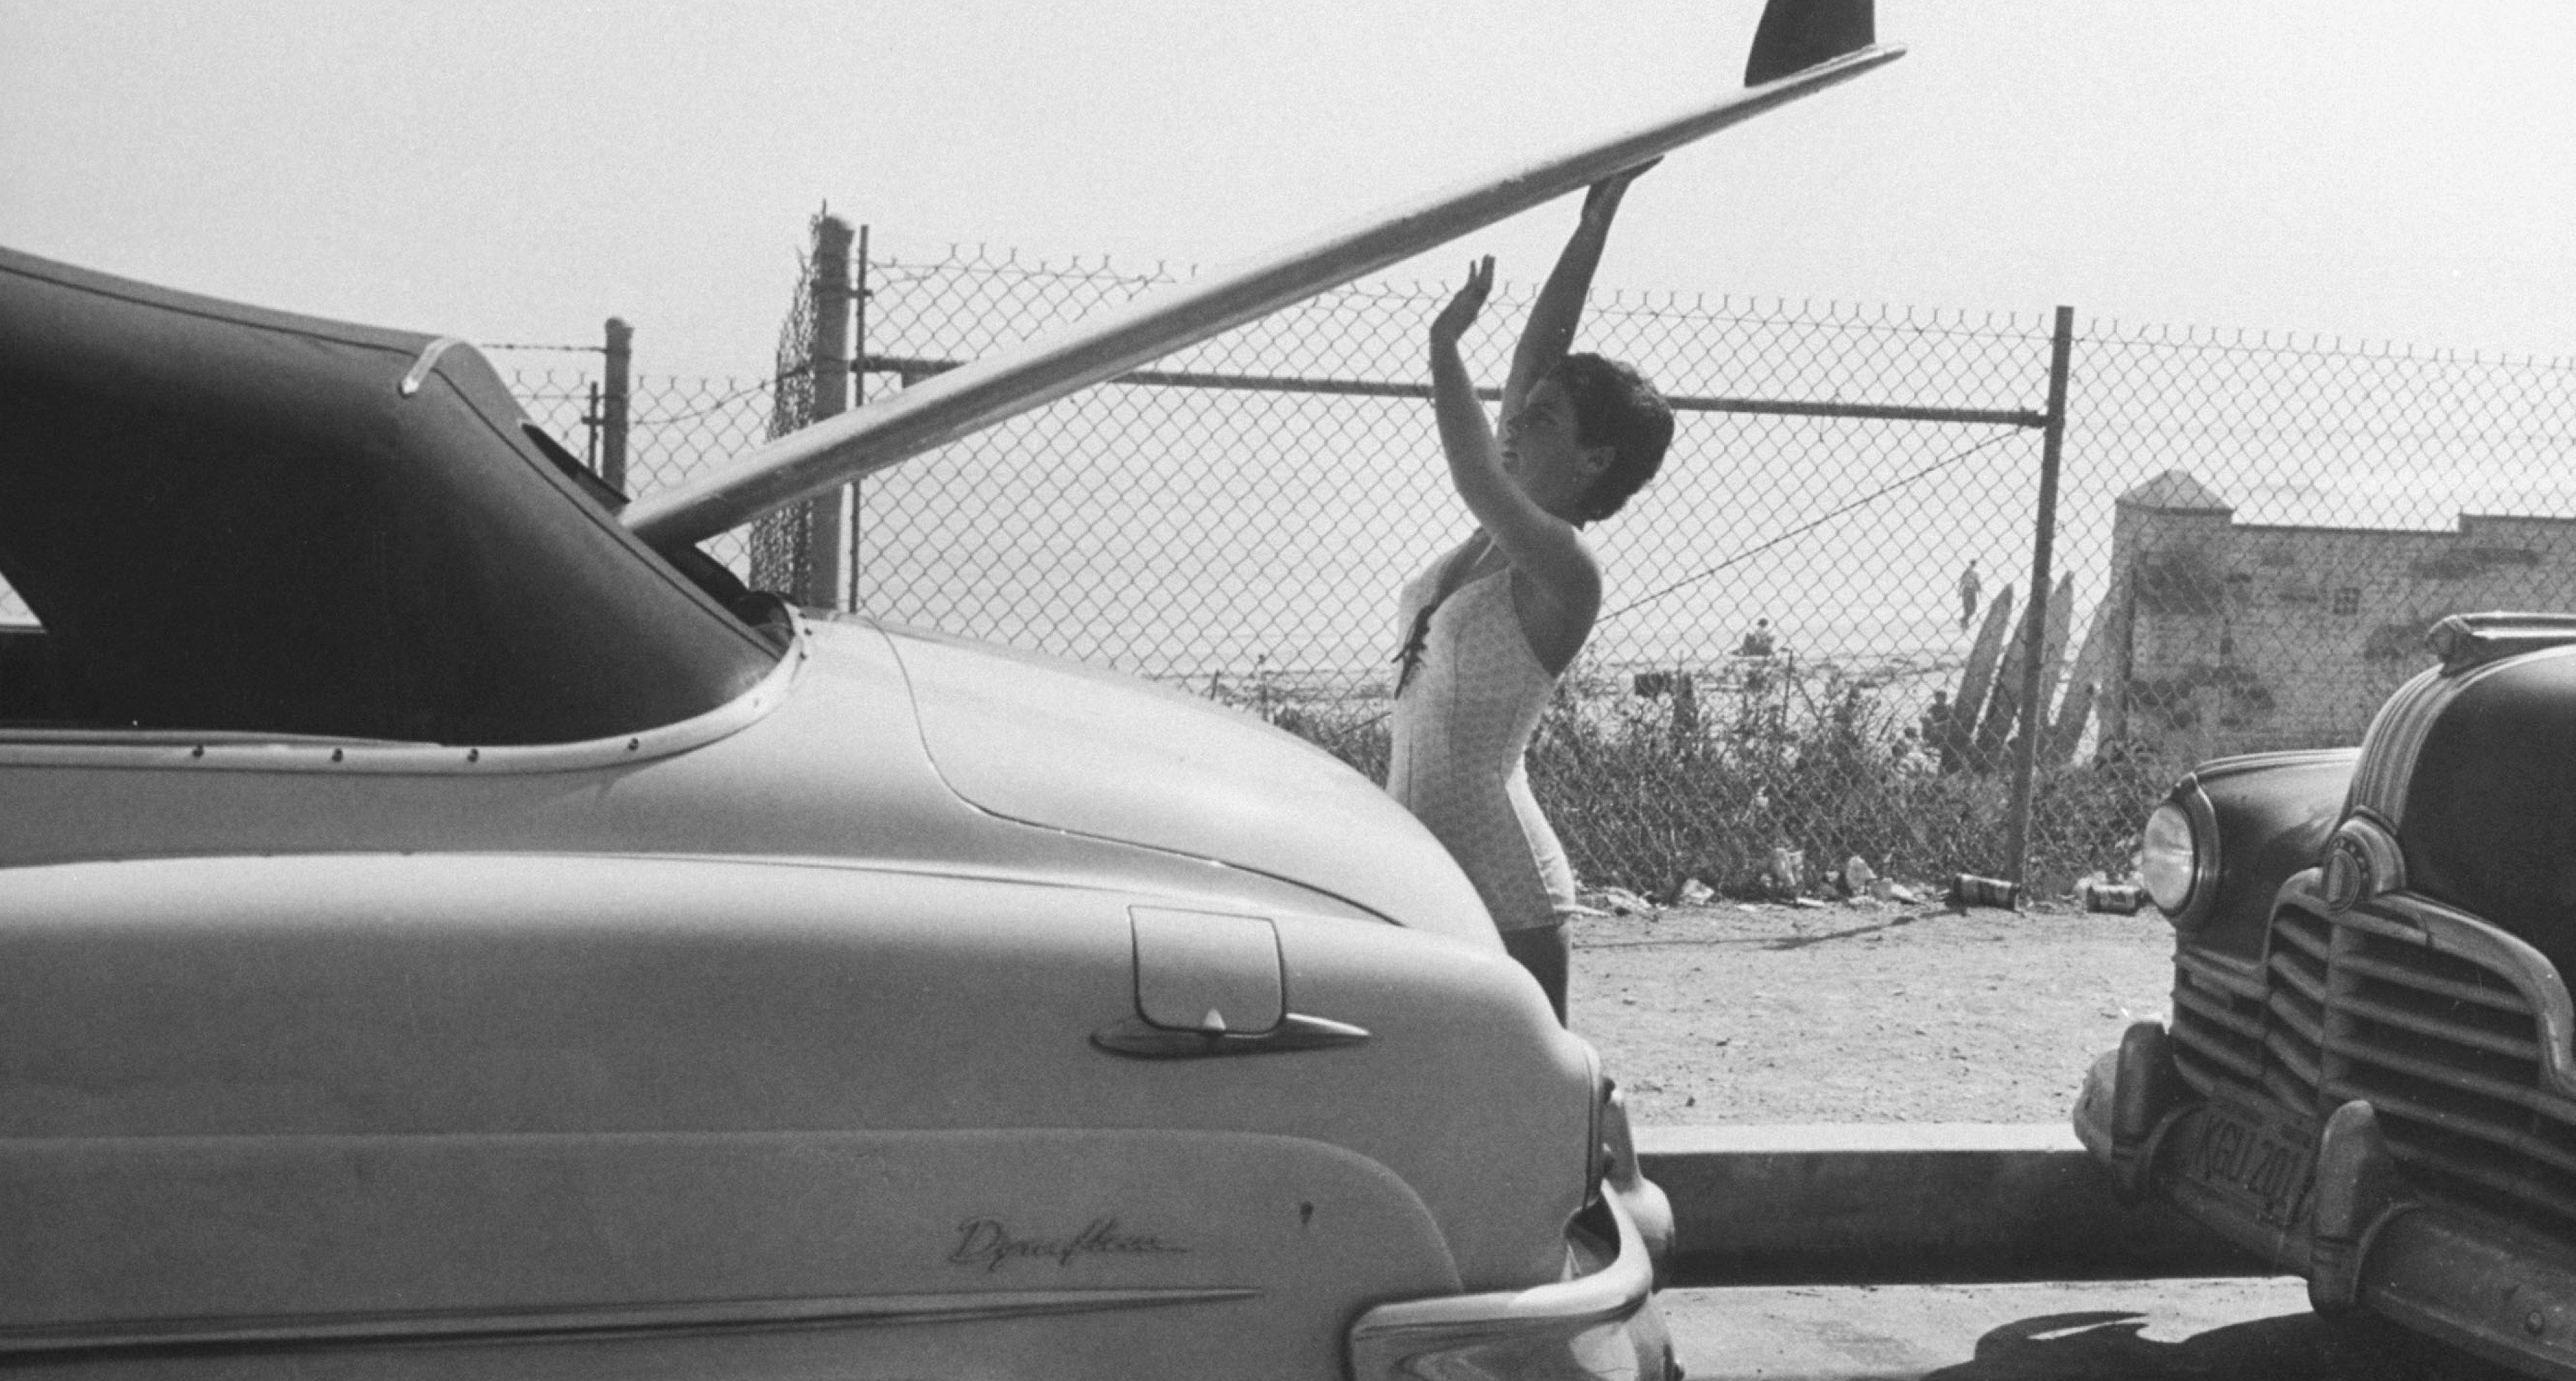 16 yr. old surfer Kathy (Gidget) Korner, while loading board into family car.